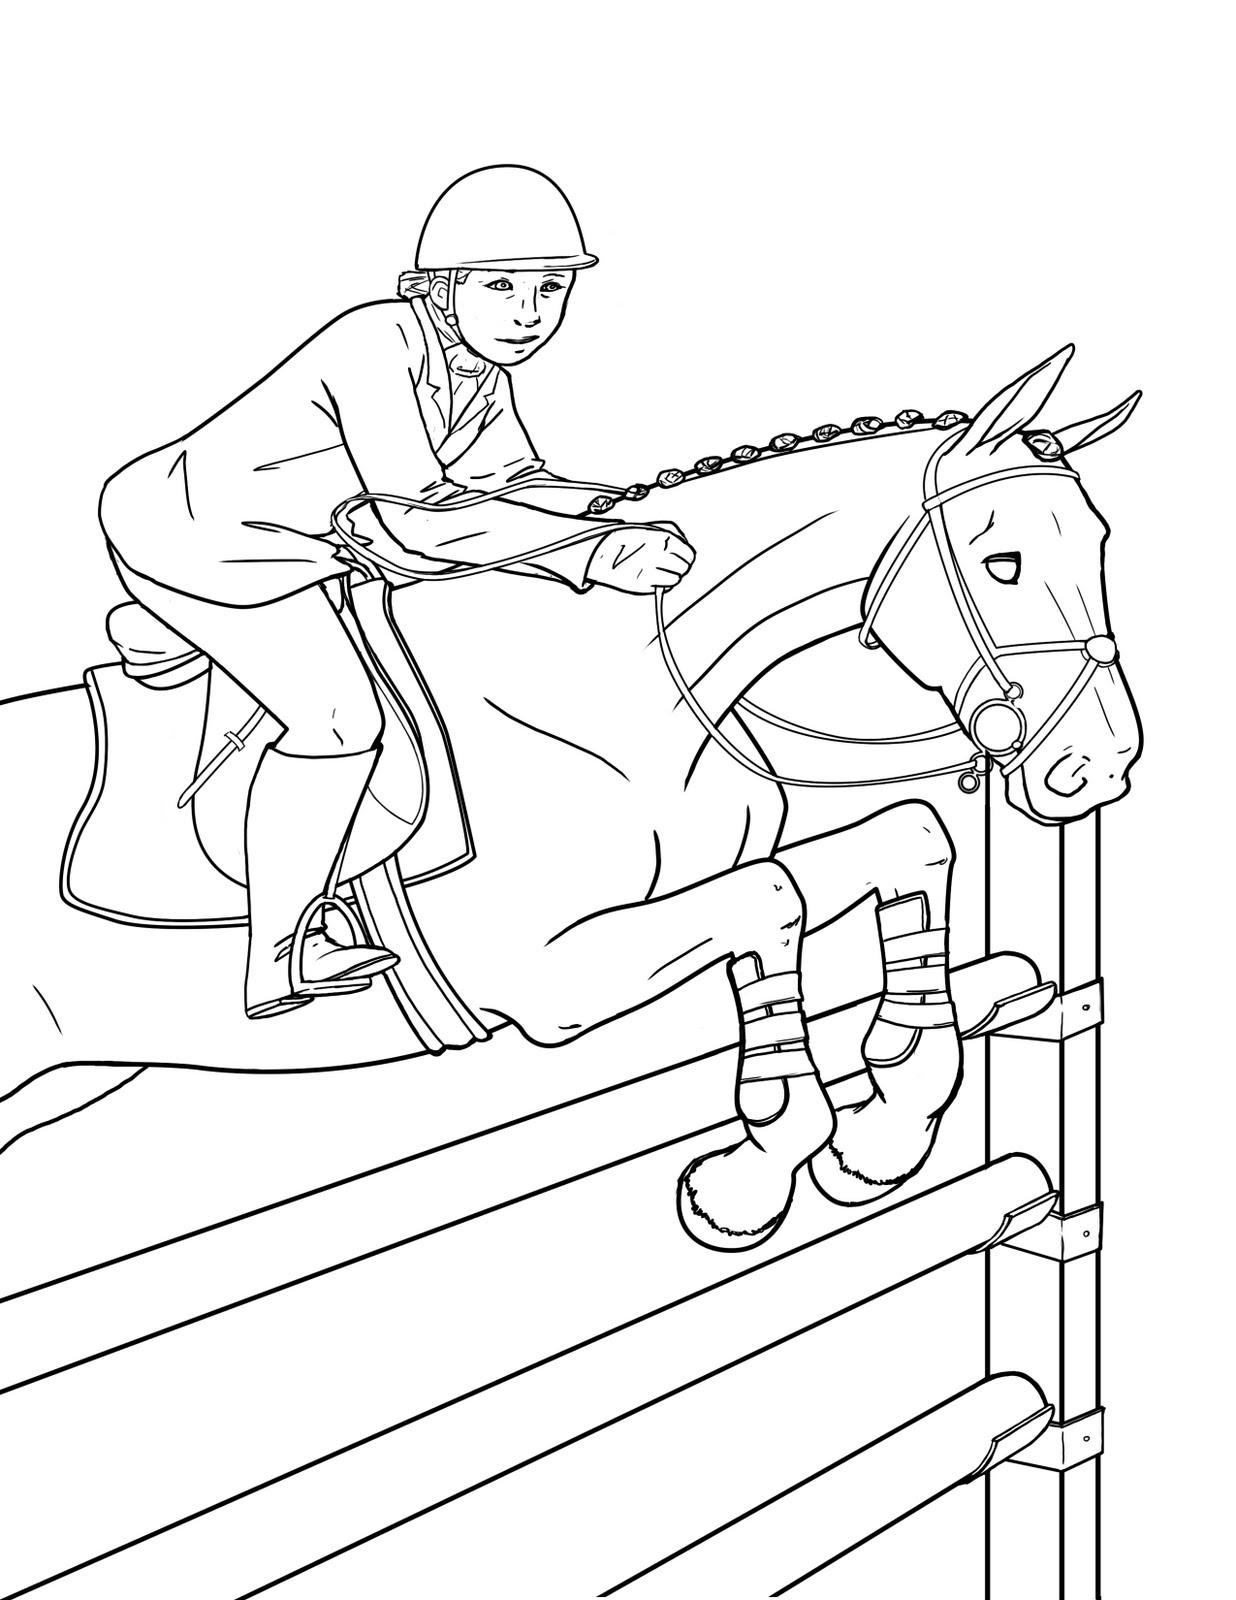 Ausmalbilder Ostwind: Laura Ambrosiano: Pony Club Coloring Book